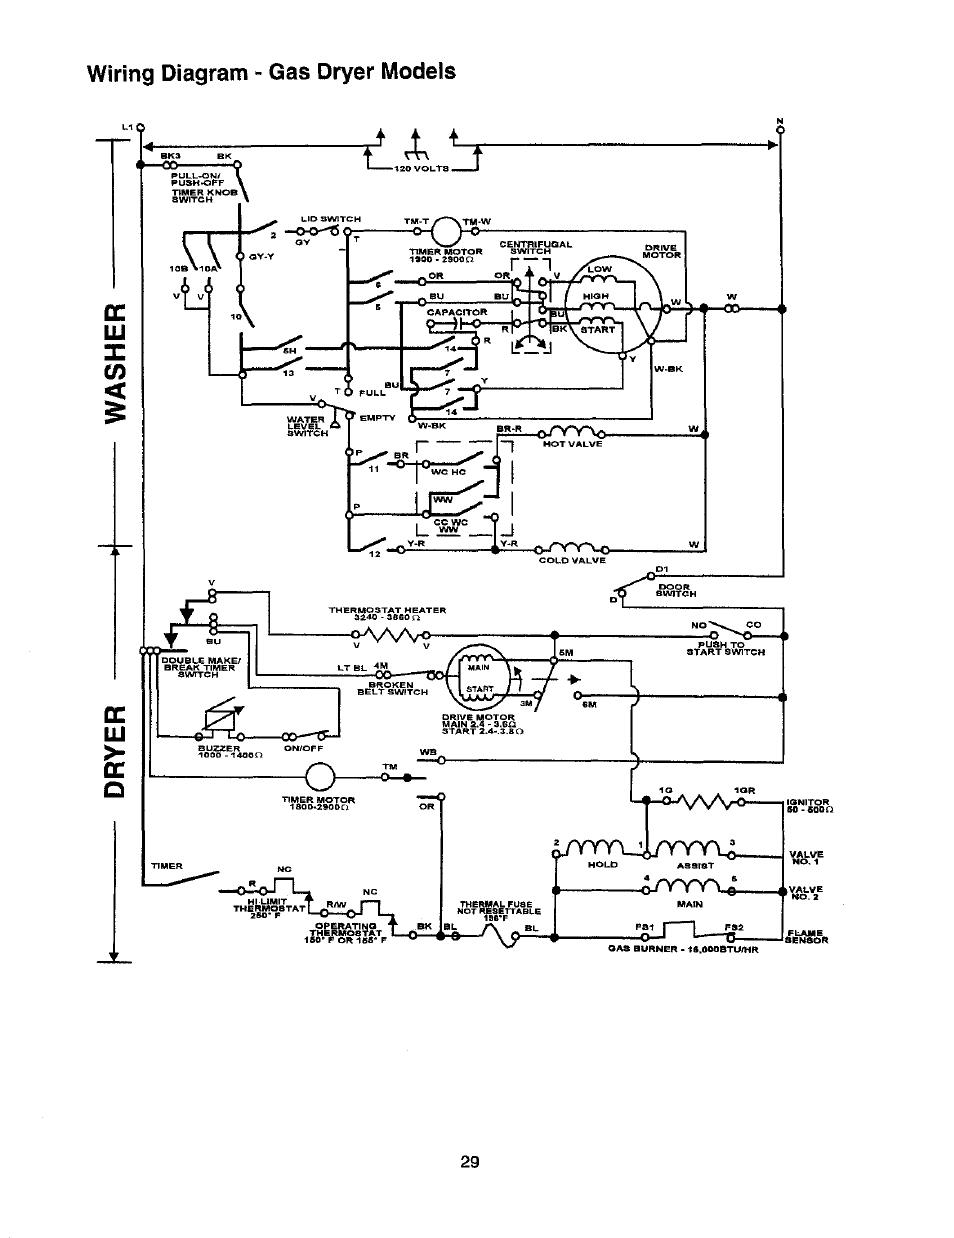 Wiring Diagram Whirlpool Gas Dryer